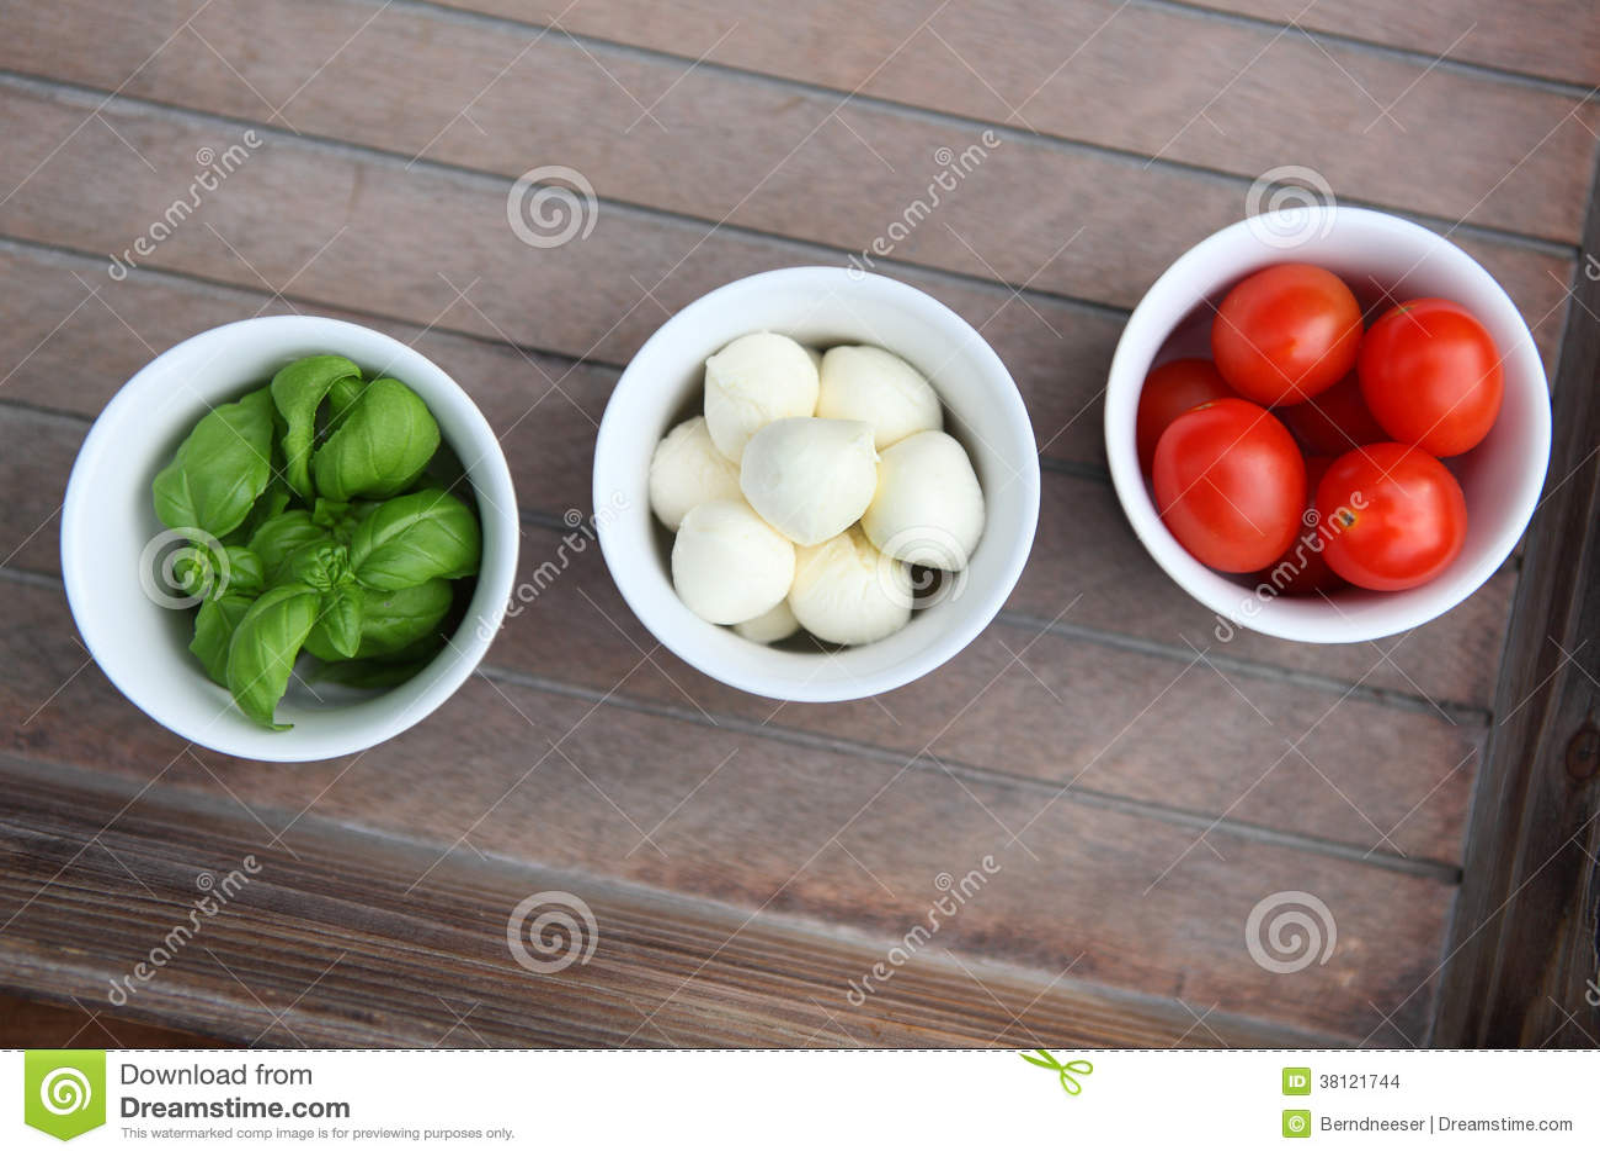 Italienisches Lebensmittel